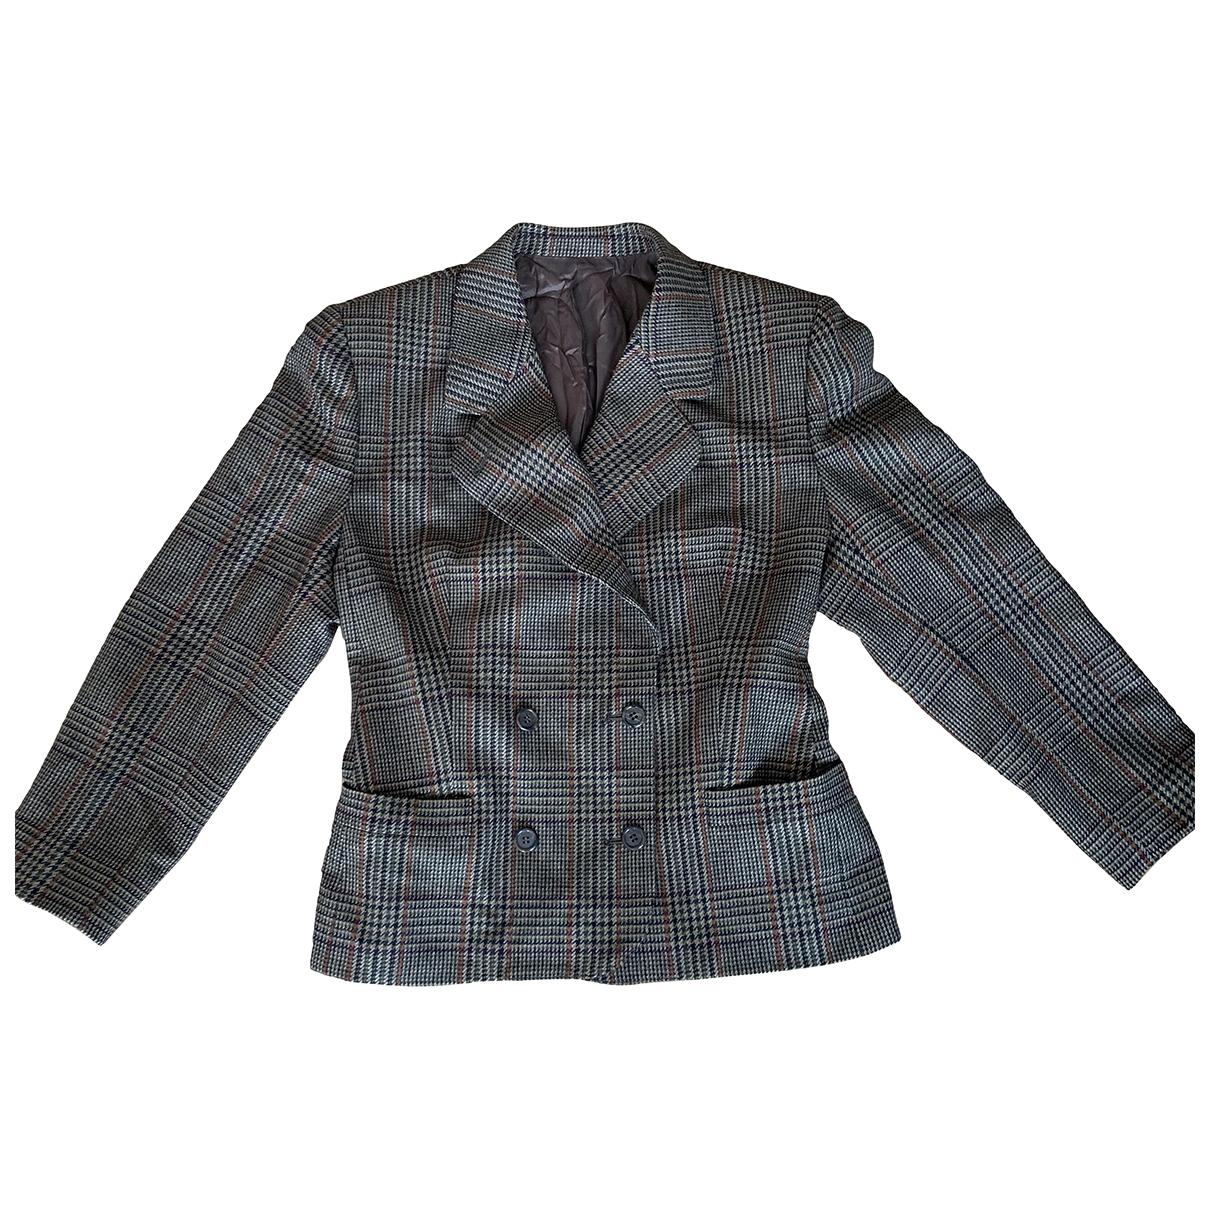 Burberry \N Brown Wool jacket for Women 44 FR